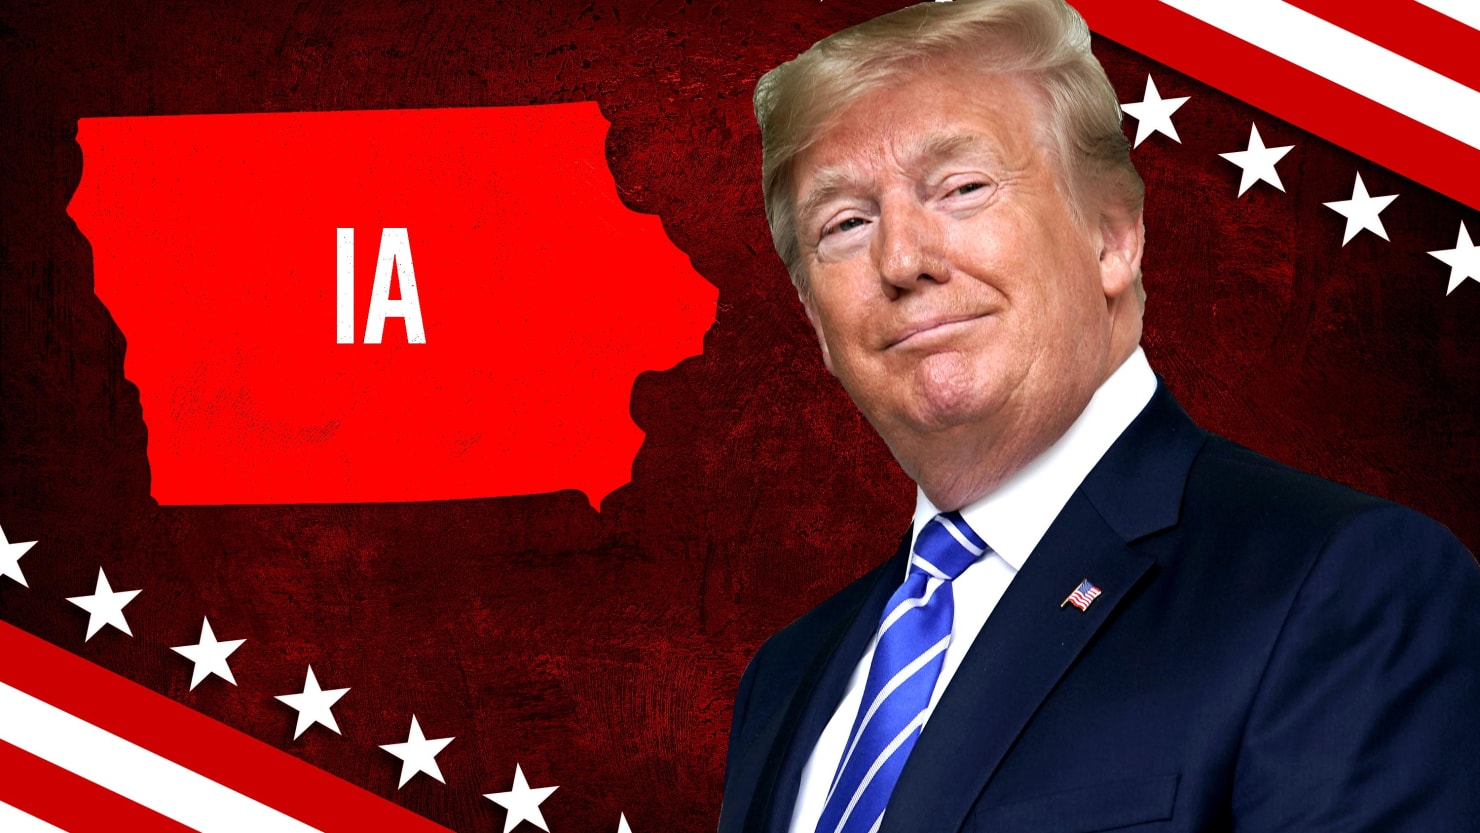 Donald Trump Wins Iowa Again